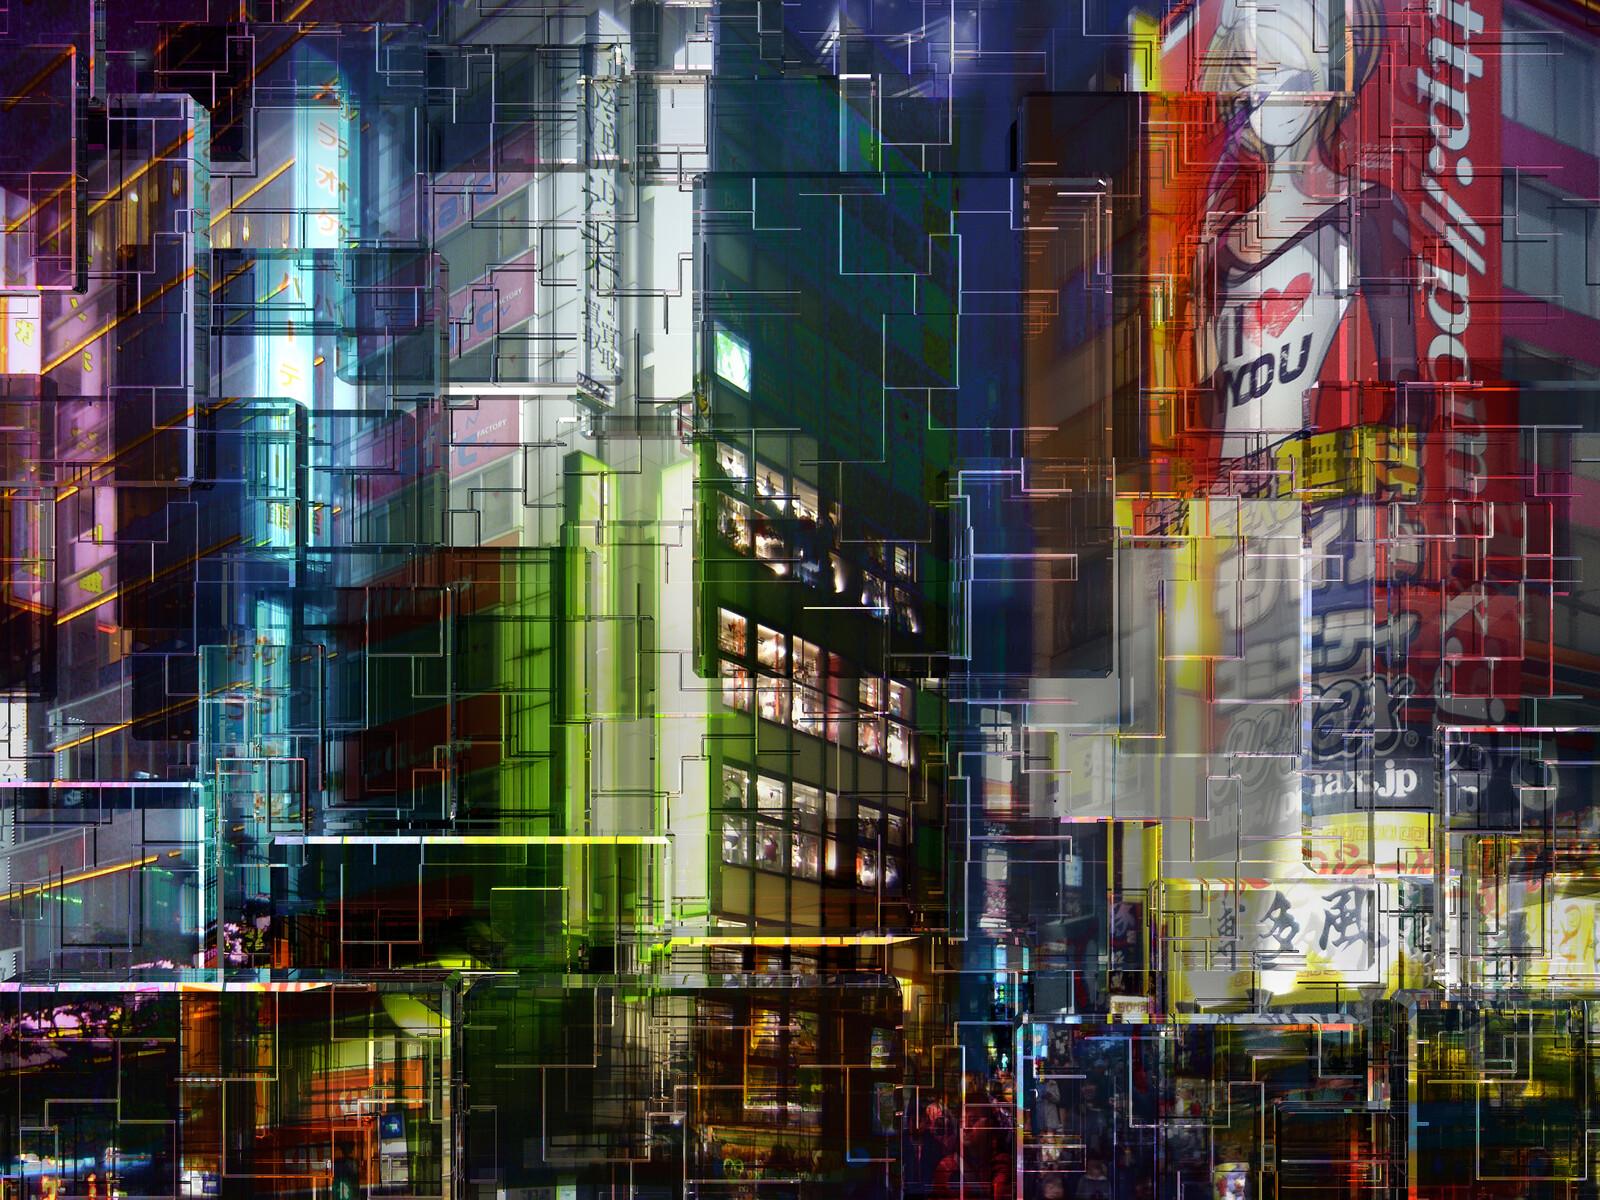 Tokio, Roppongi - Andrej Barov